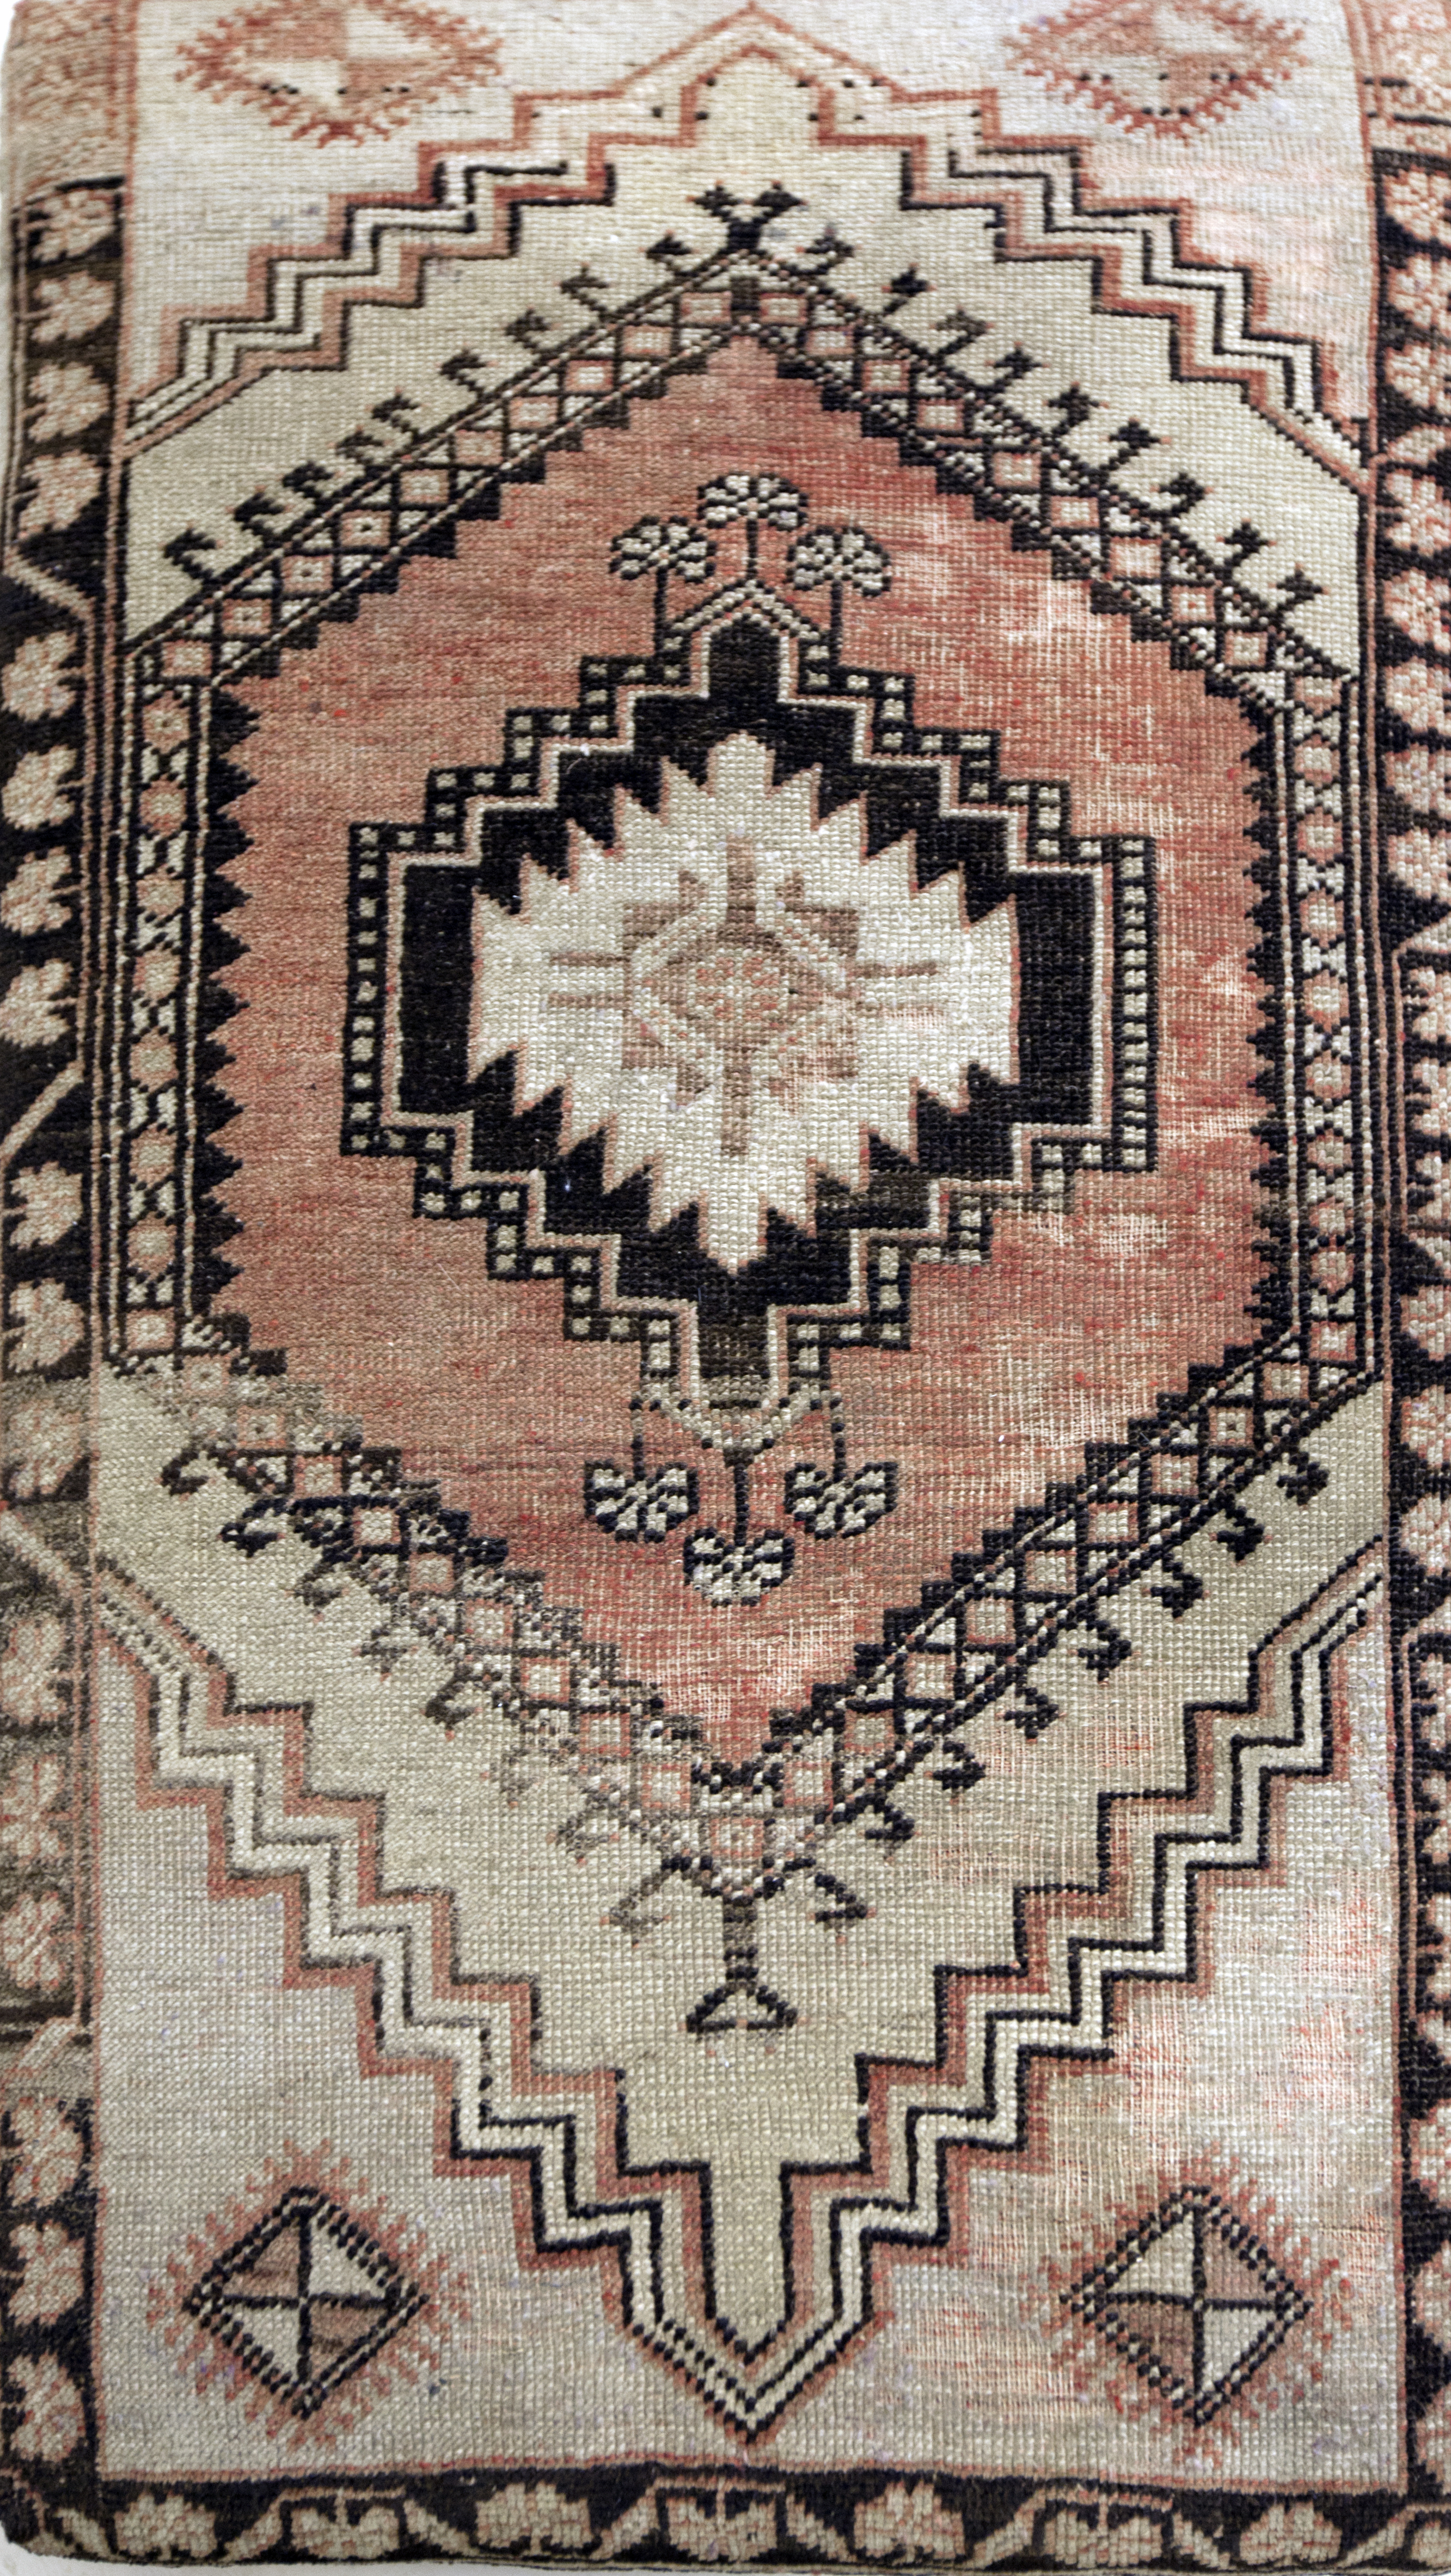 Delightful Antique Rug Ottoman, 27u2033D X 45u2033W X 18u2033H, Regular Price $1999, Sale Price  $1699